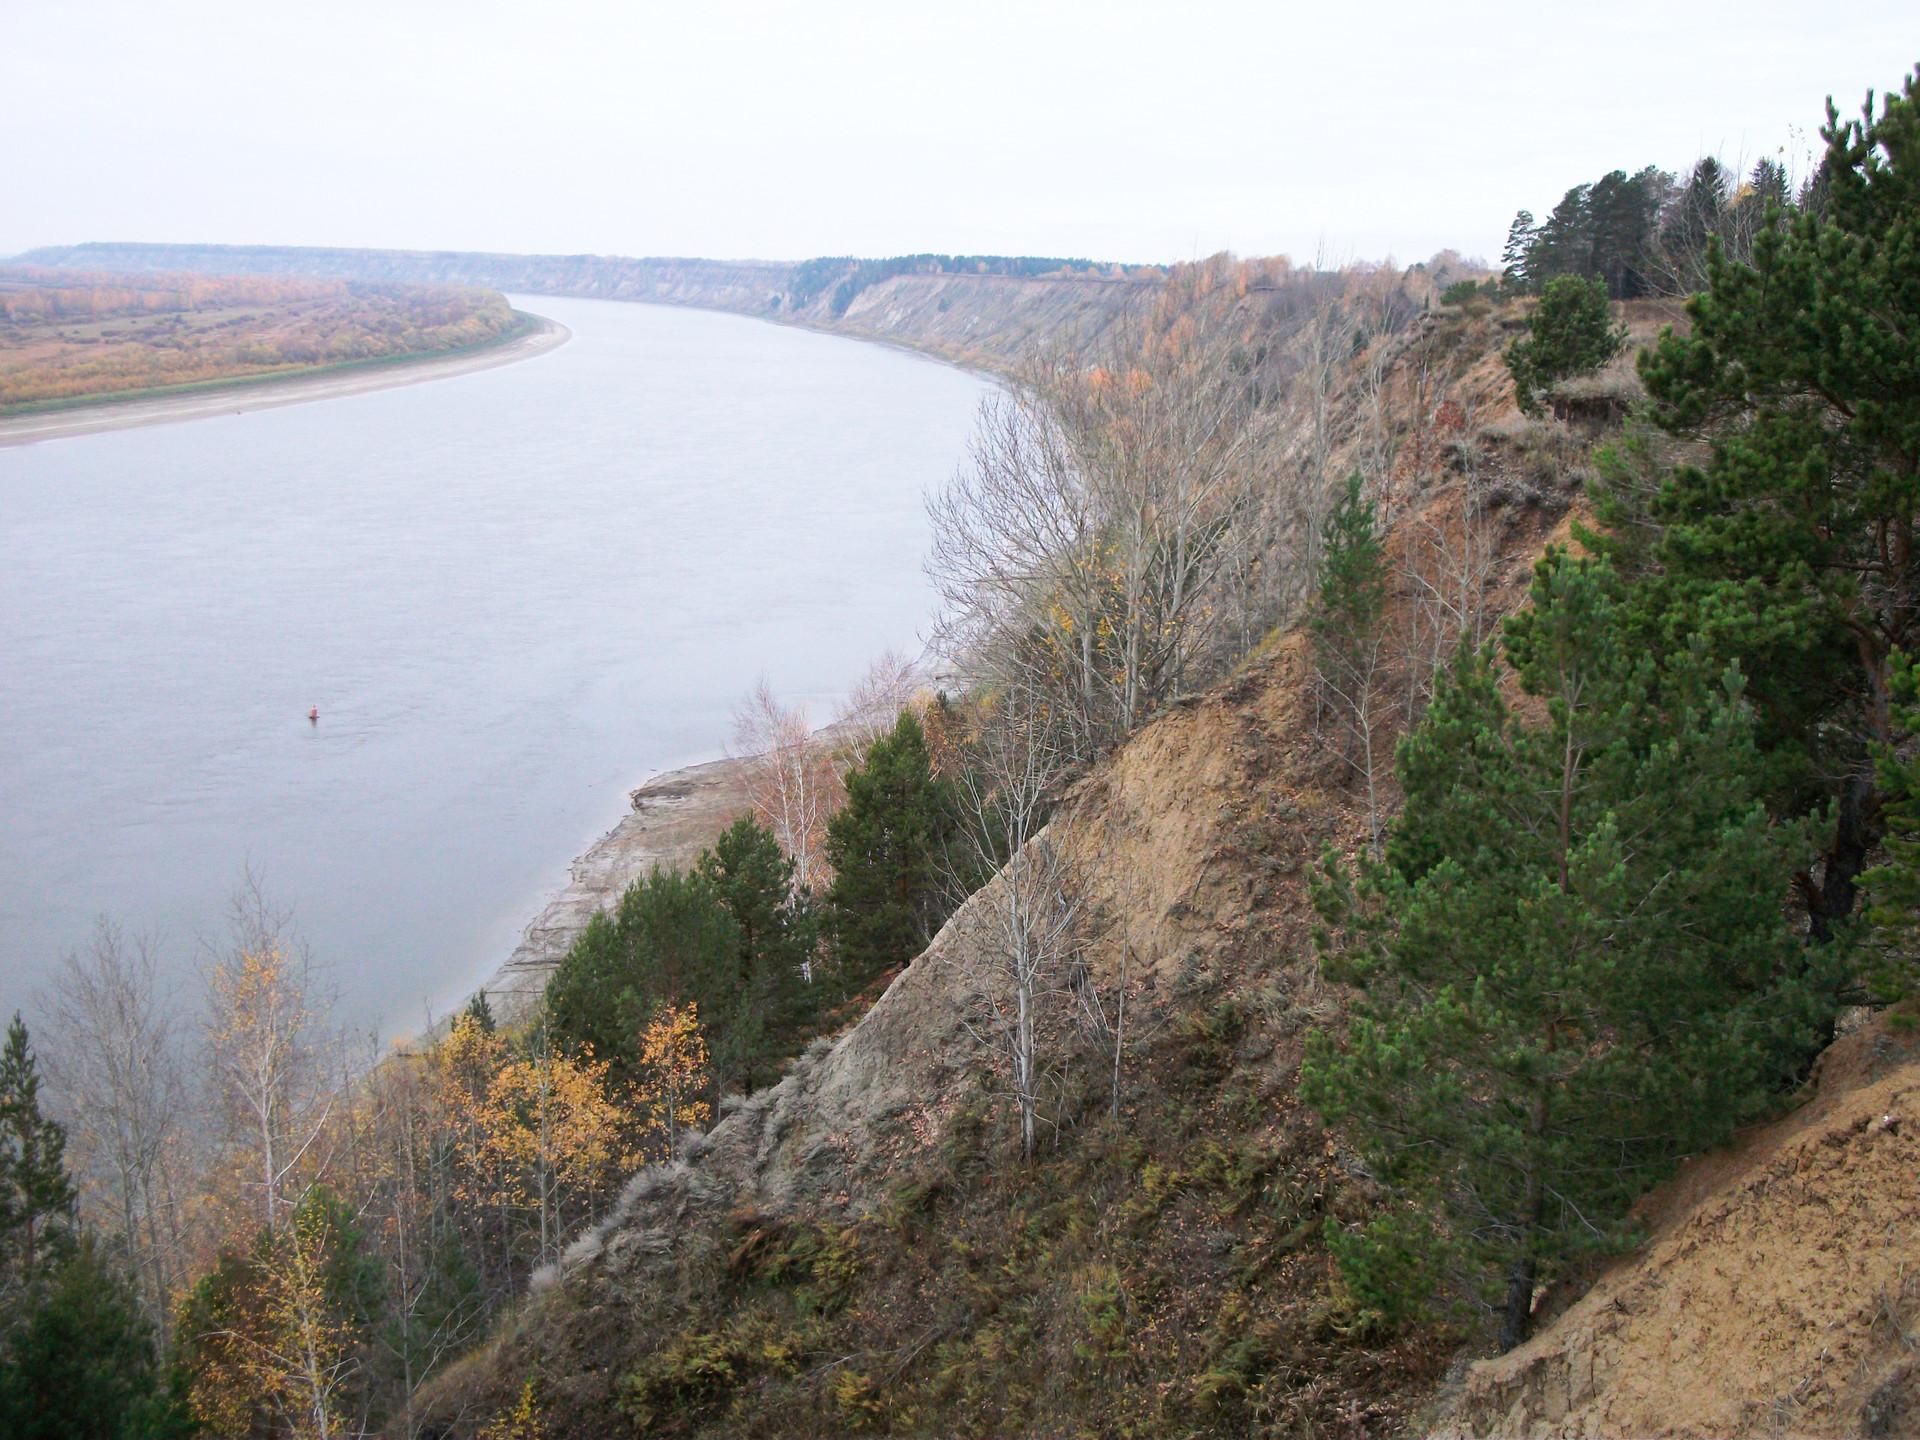 Bukit tempat dulu Kashlyk (Sibir) berdiri. Oblast Tyumen, Rusia.